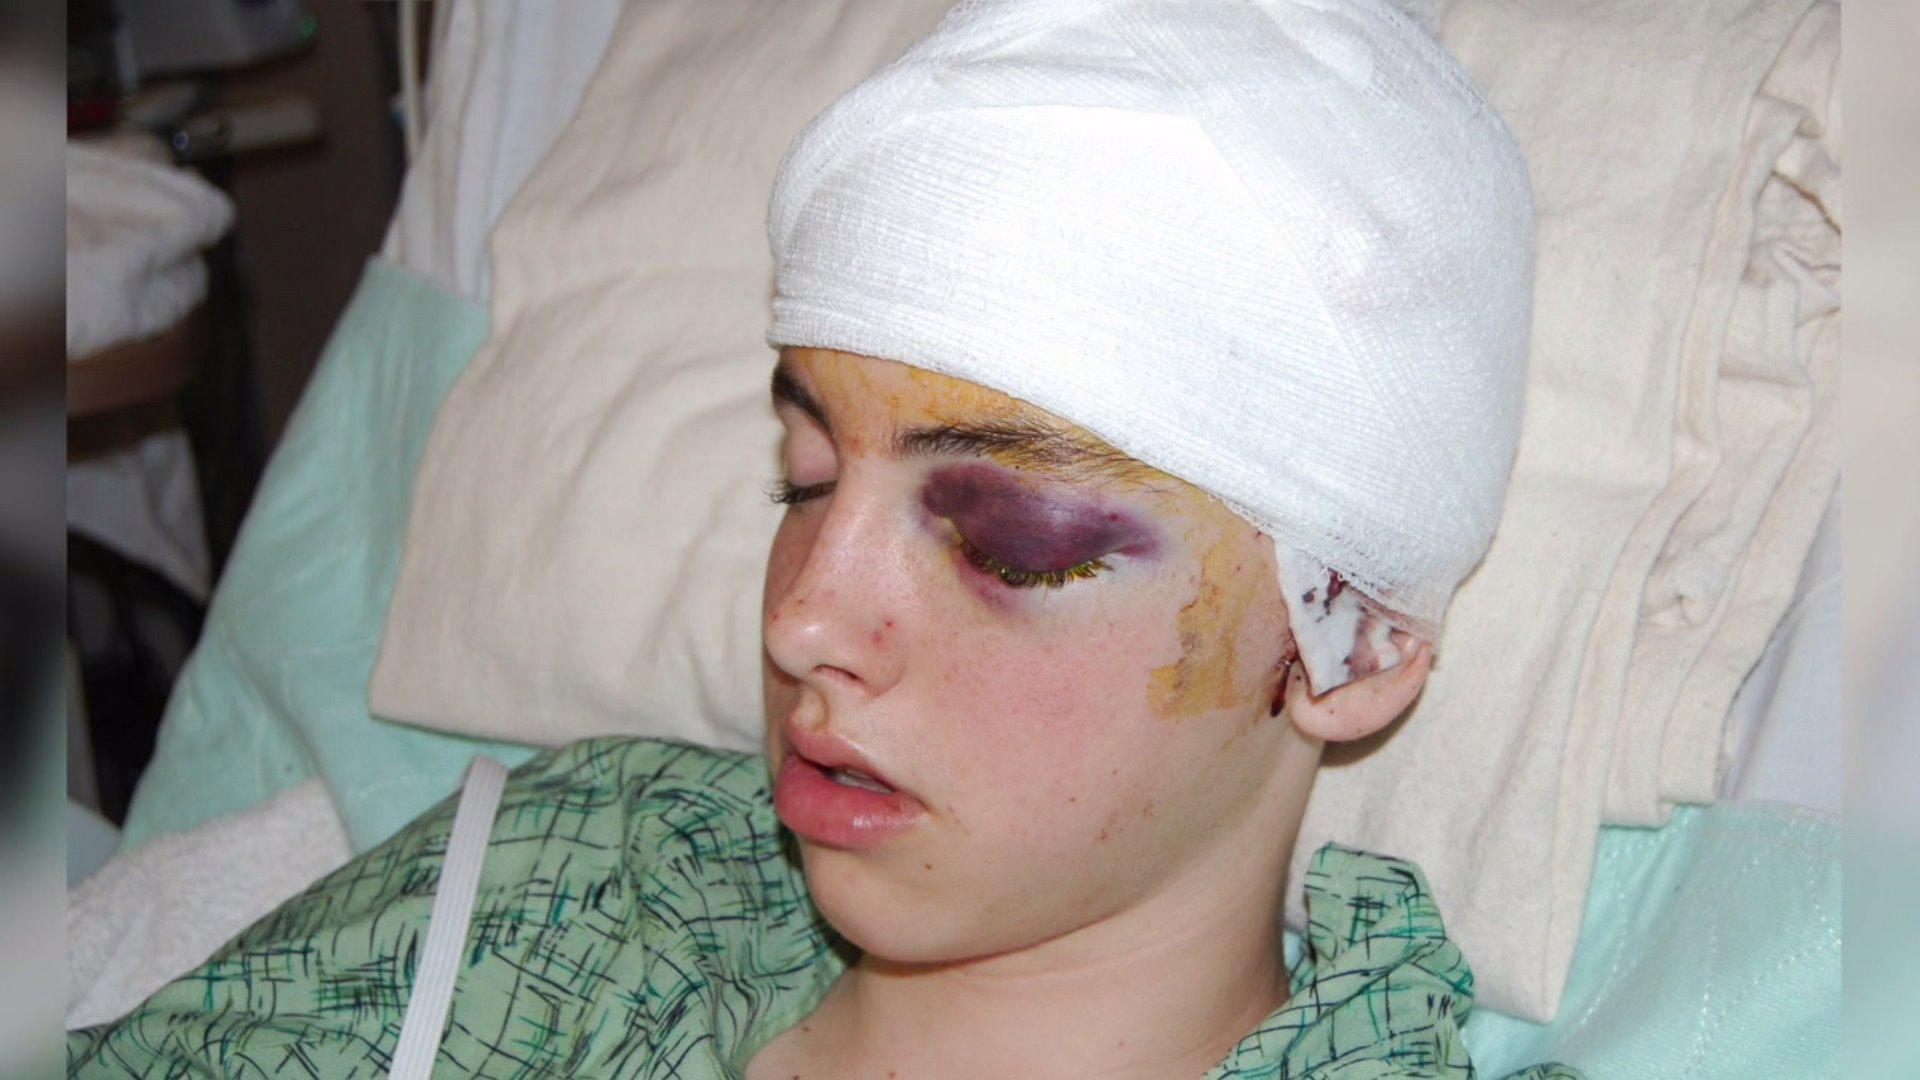 Slattery injury